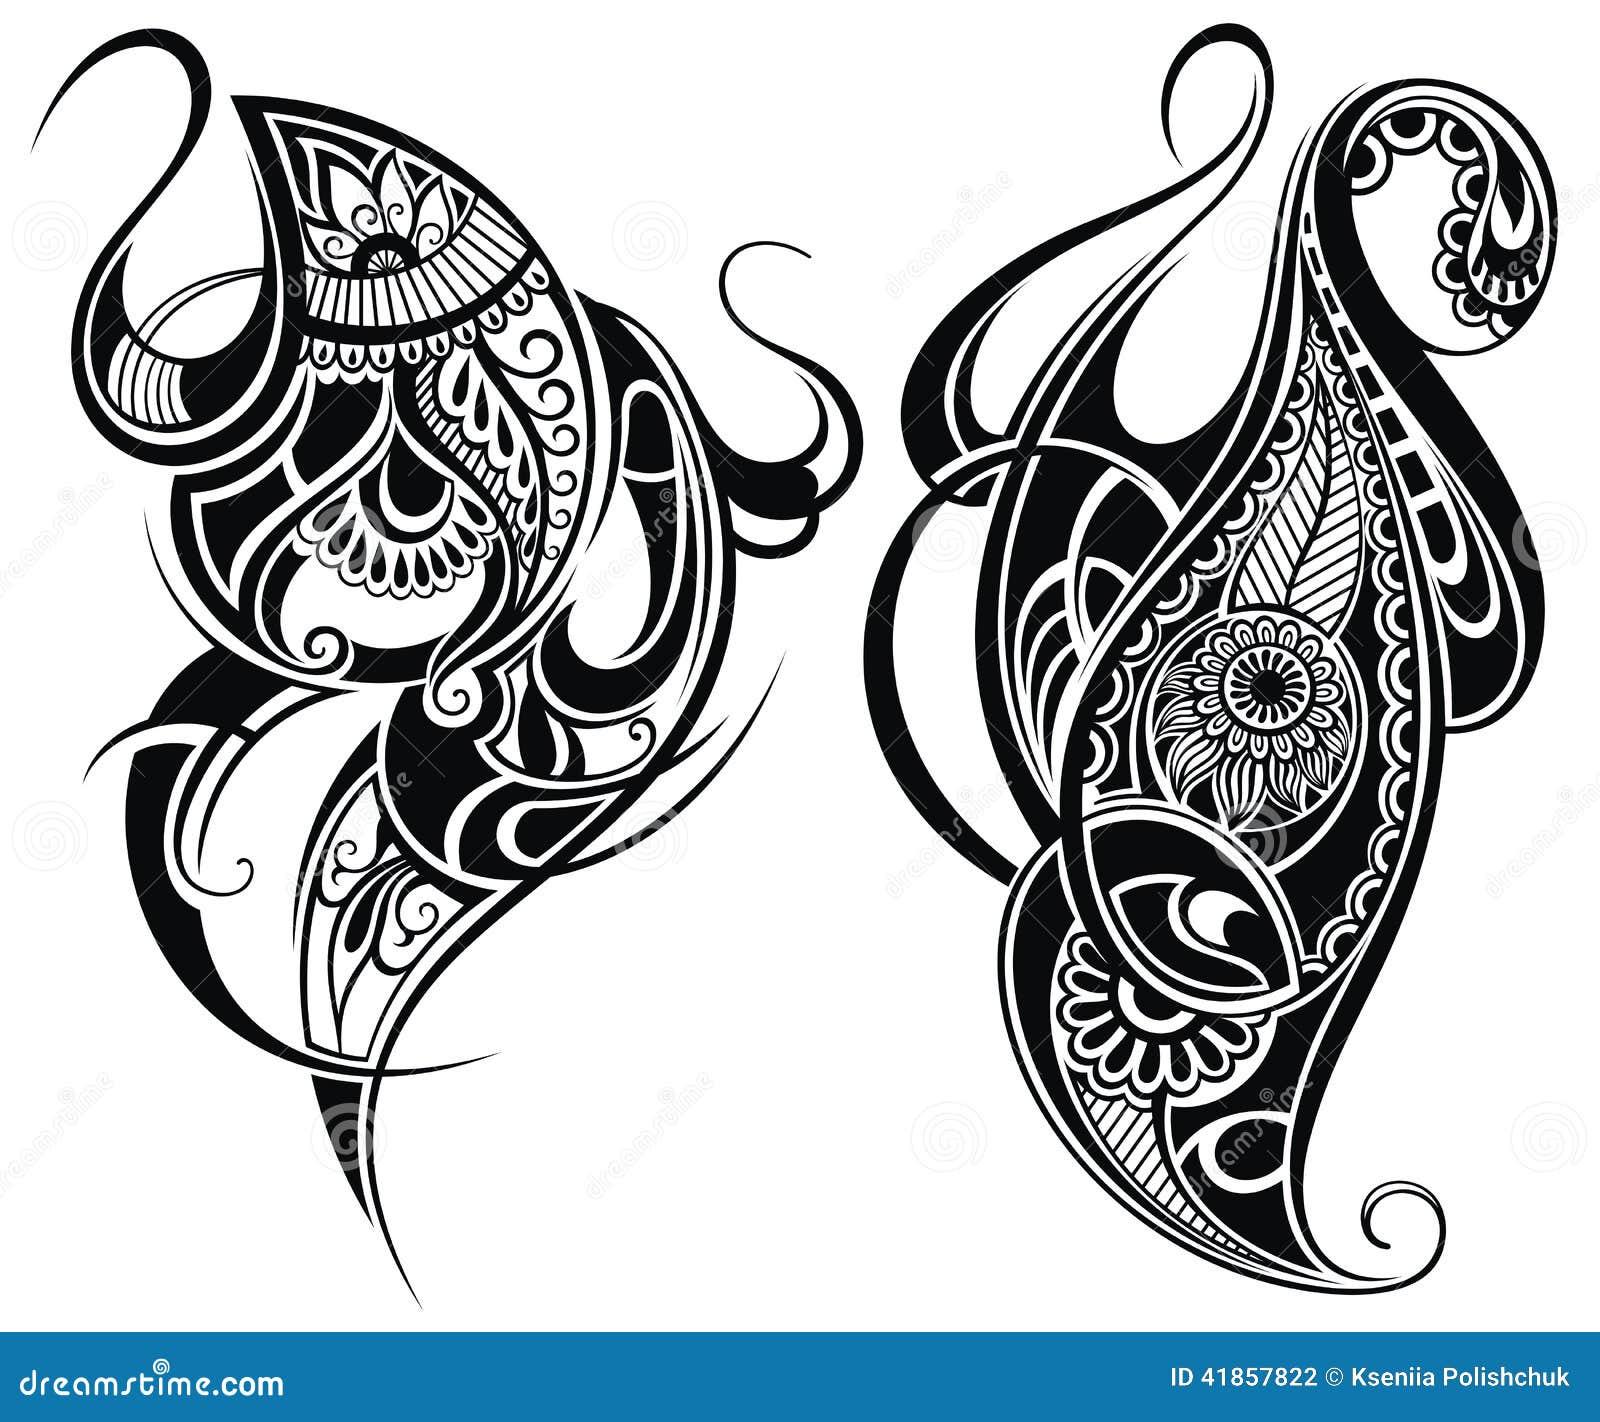 tribal tattoo elements stock vector image 41857822. Black Bedroom Furniture Sets. Home Design Ideas